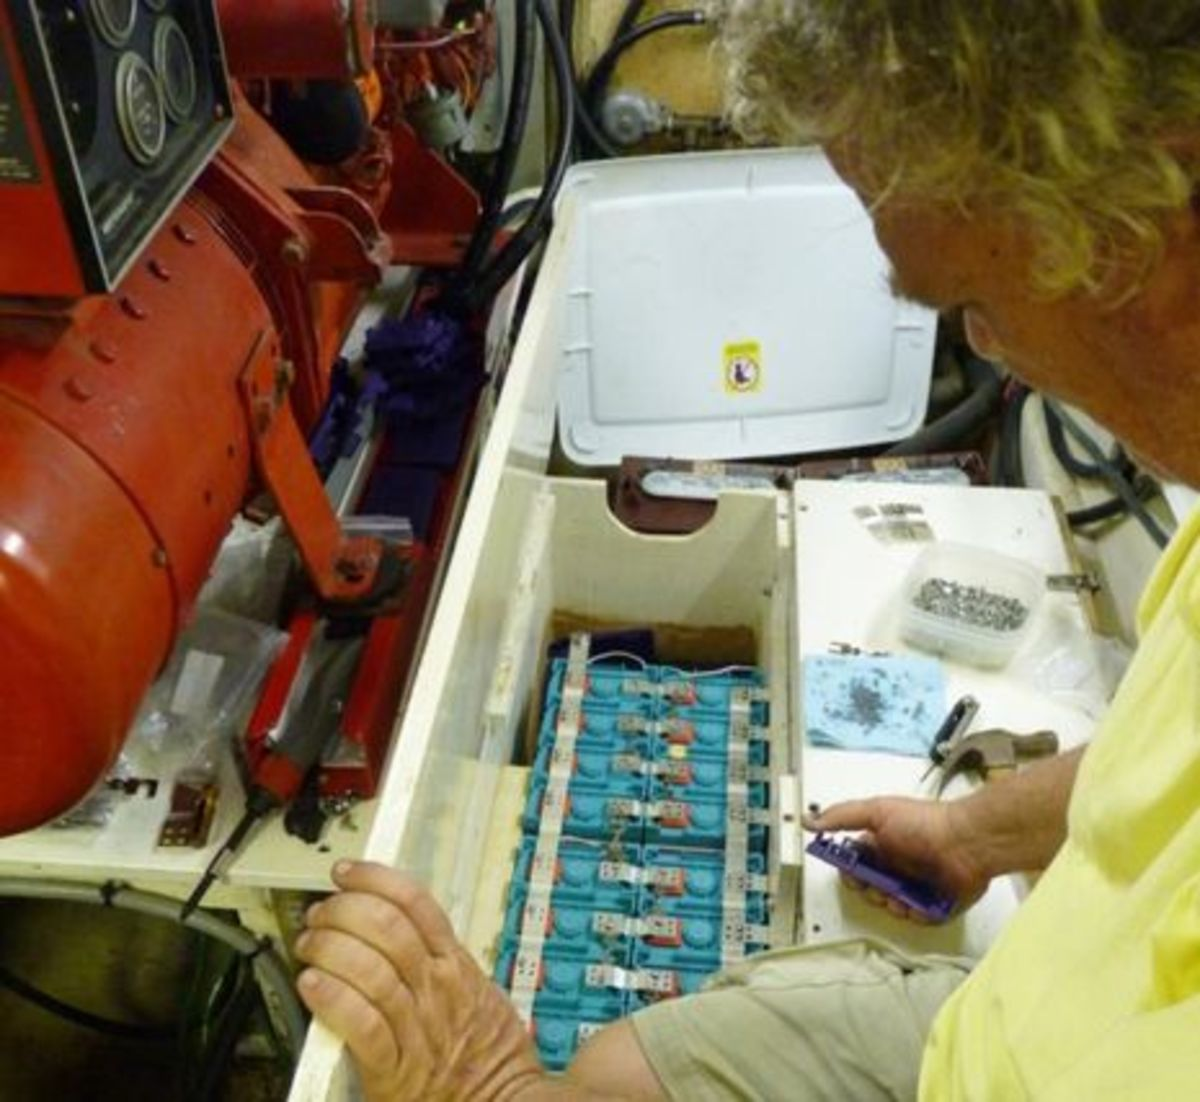 DIY_Lithium_Iron_Phosphate_boat_batteries_courtesy_Bob_Ebaugh.jpg